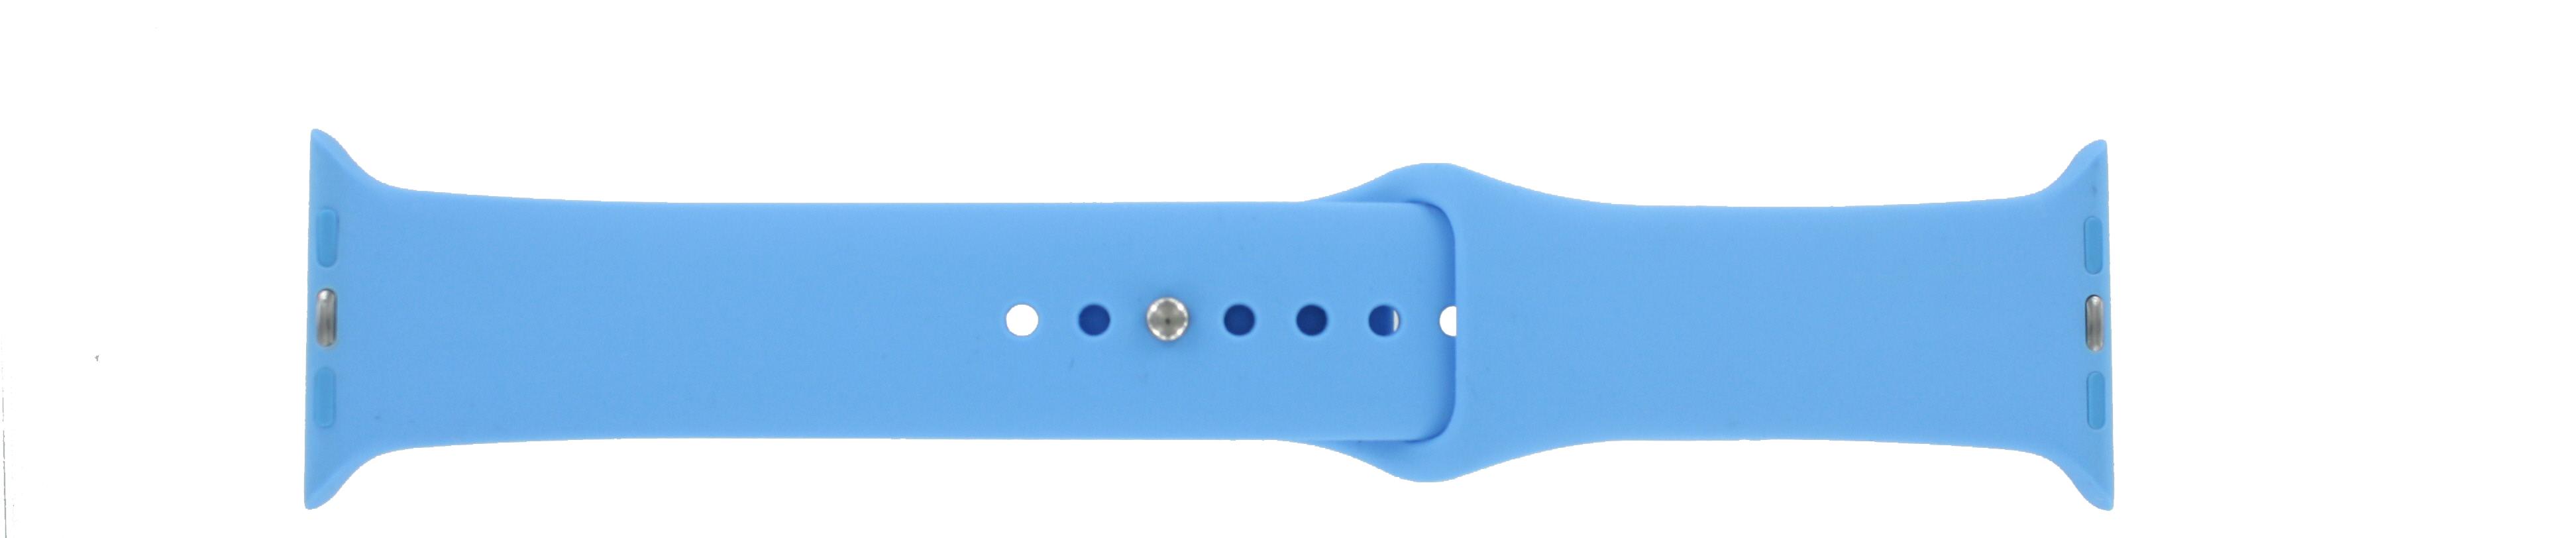 Apple (vervangend) horlogeband LS.AB.109 Silicoon Blauw 42mm